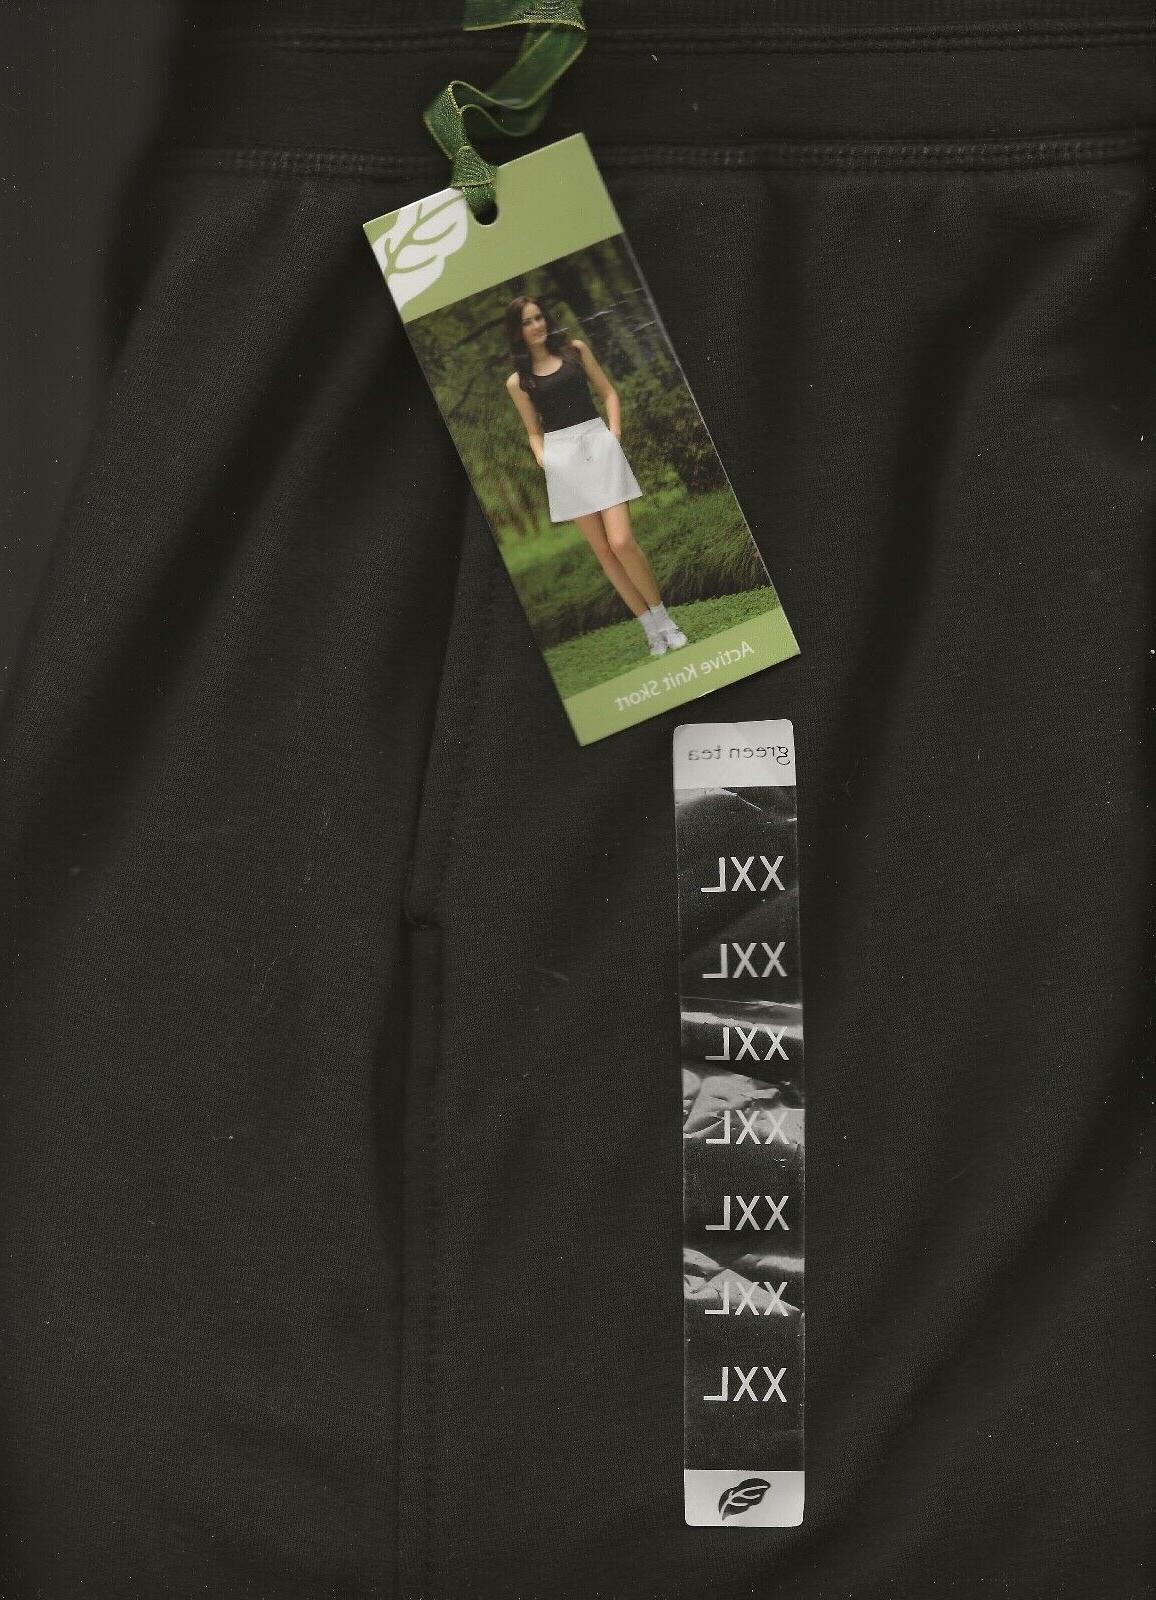 - Dark Olive Wm's XXL blend, Pockets